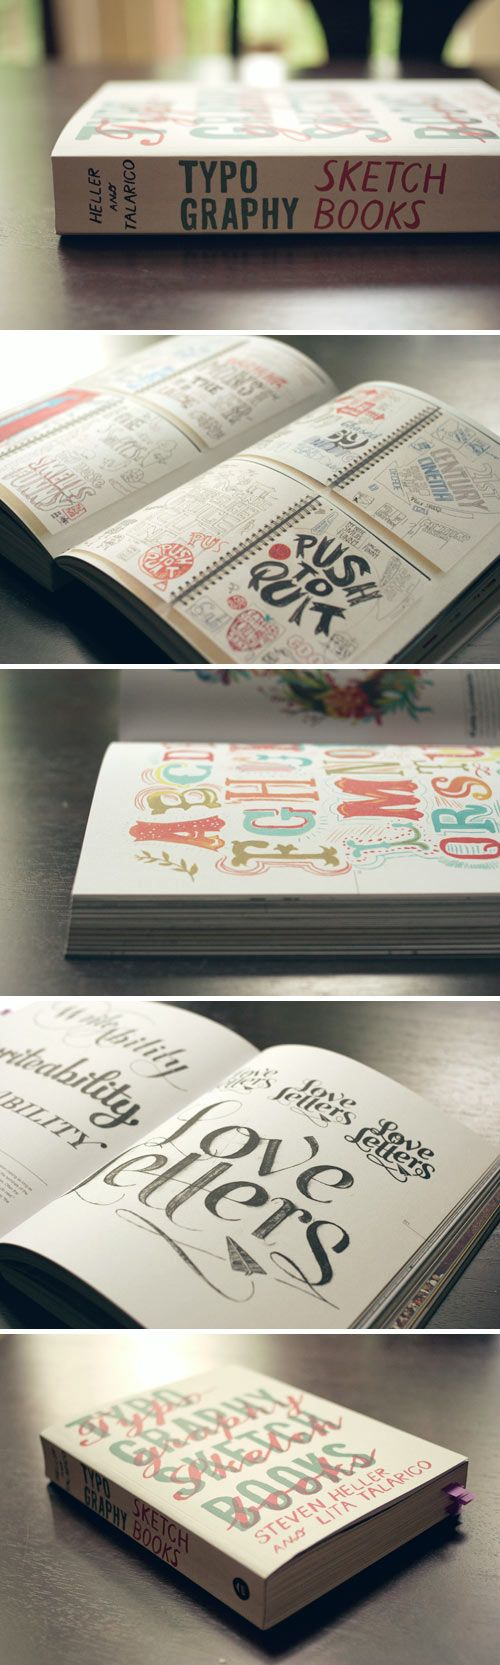 Typography Sketchbooks #typography